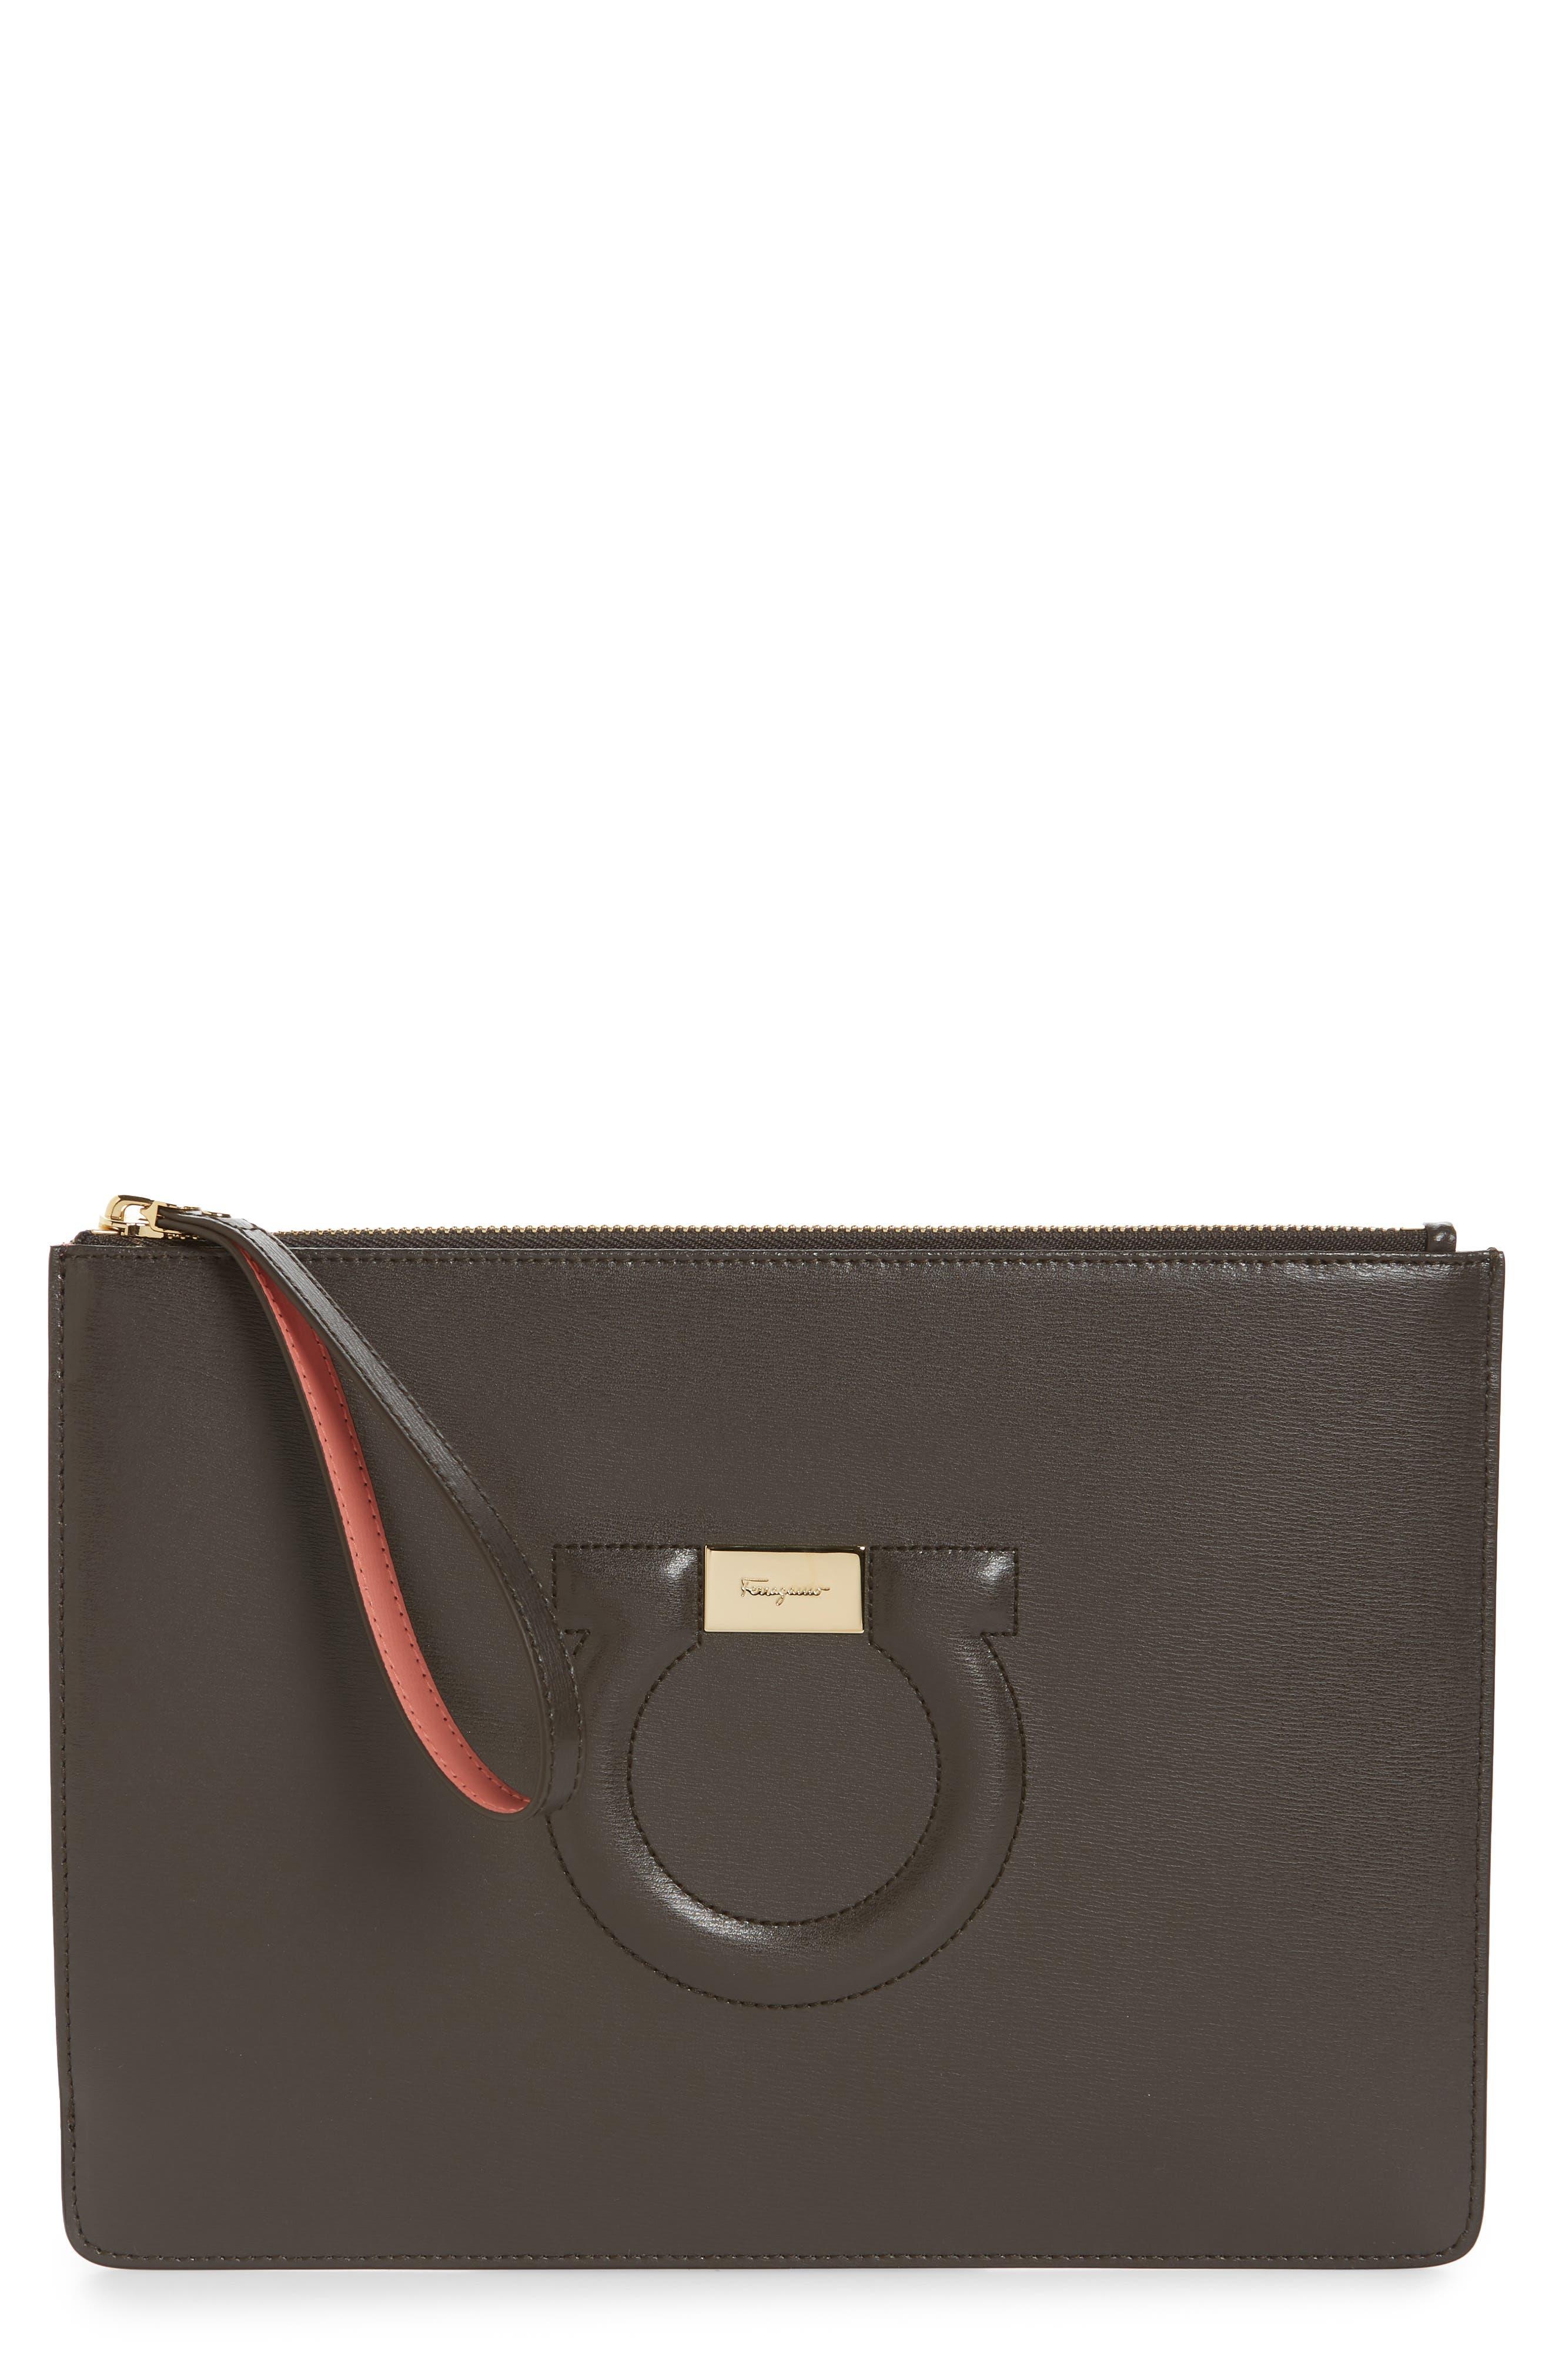 8e12c6d0430f Women's Salvatore Ferragamo Handbags   Nordstrom